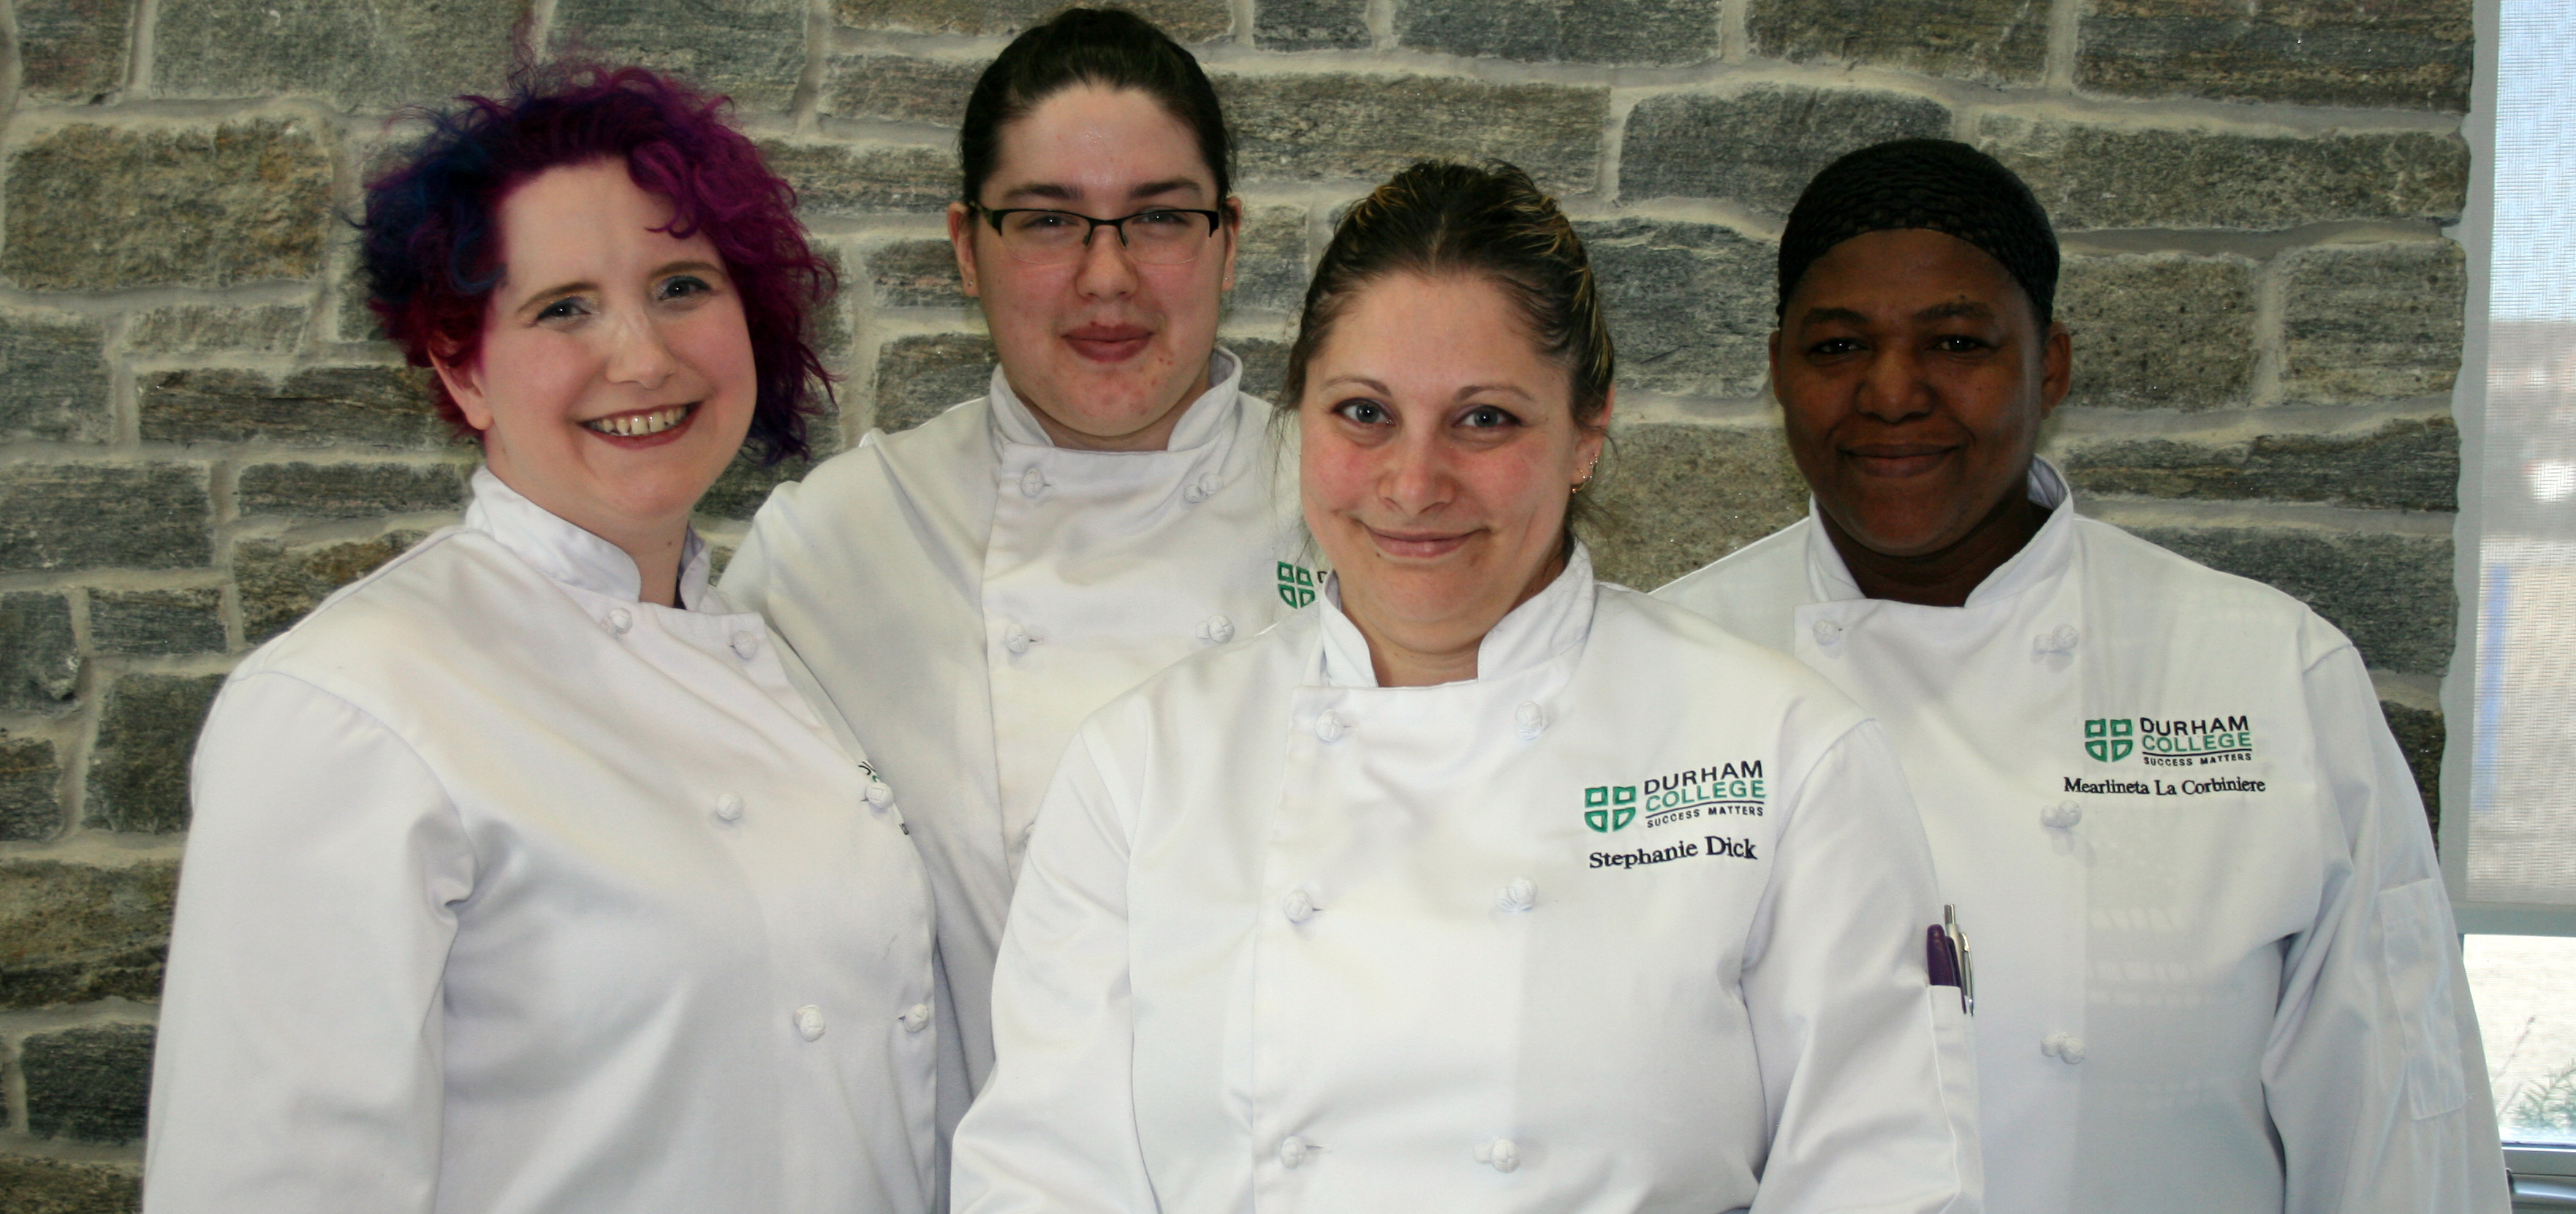 CFF students Popup Bake Shop